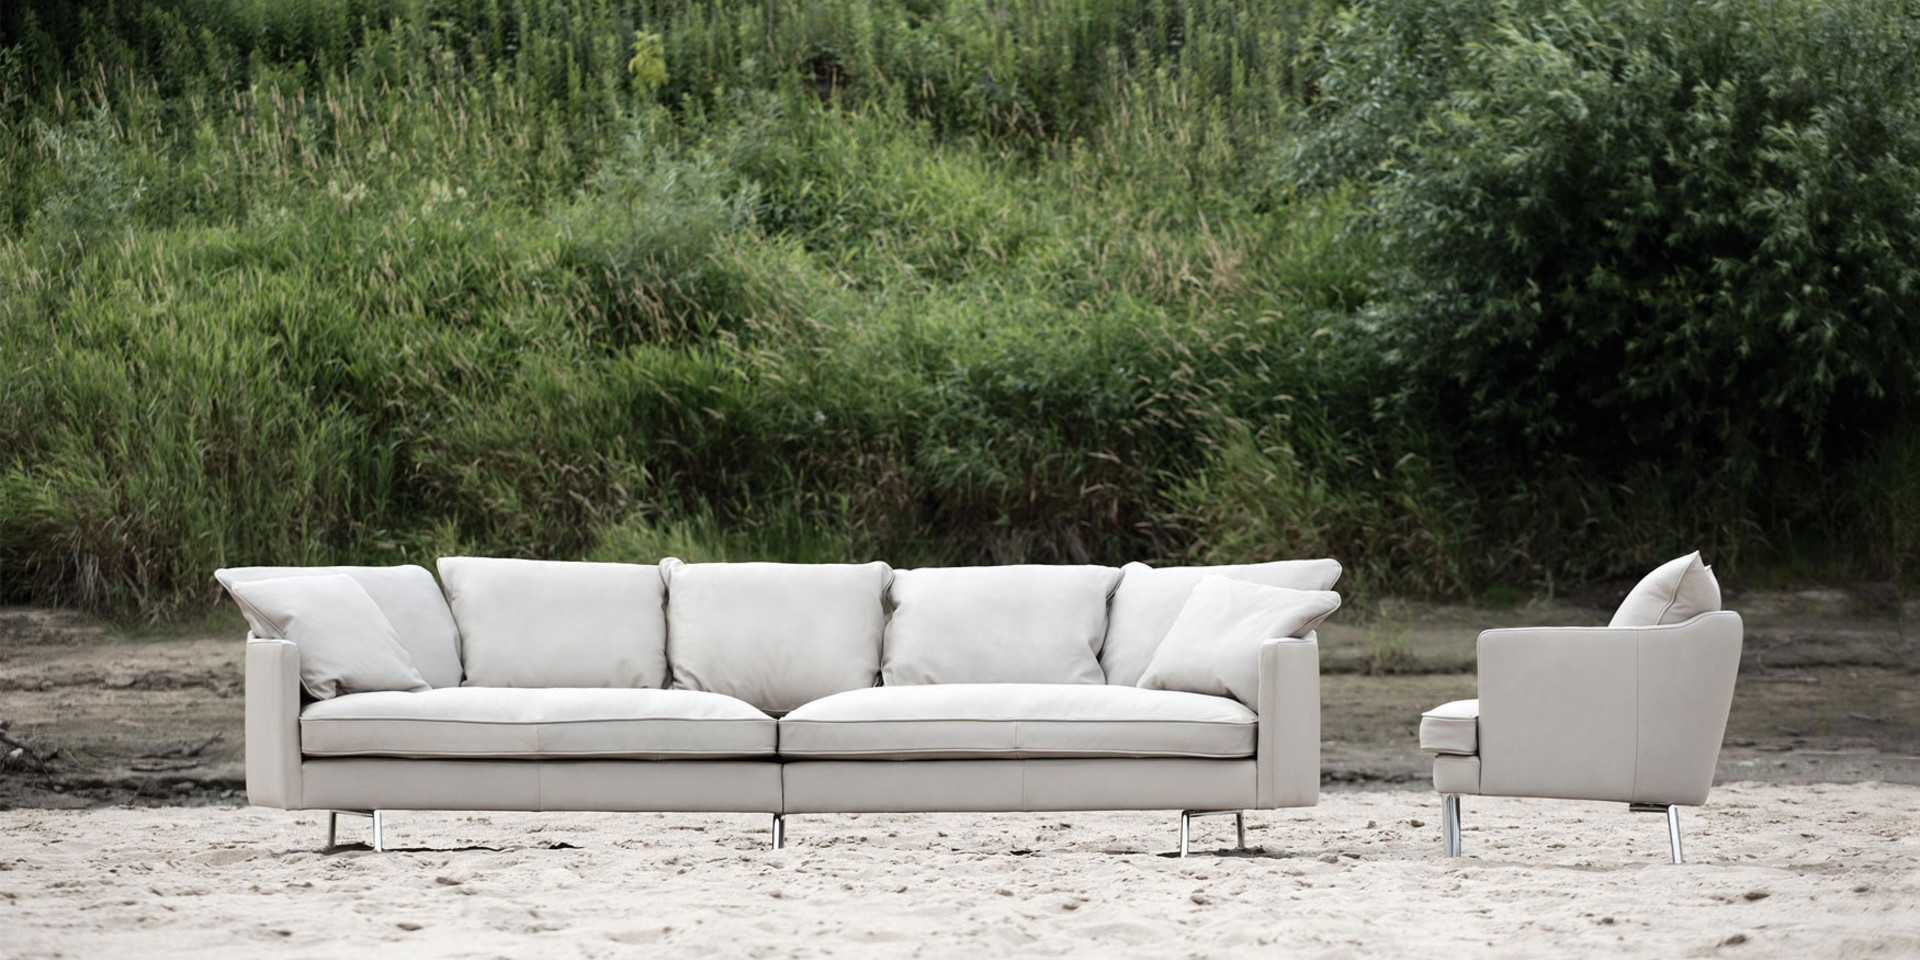 sits-julia-ambiance-arrangement_4seater_round_armchair_aniline_sand_3